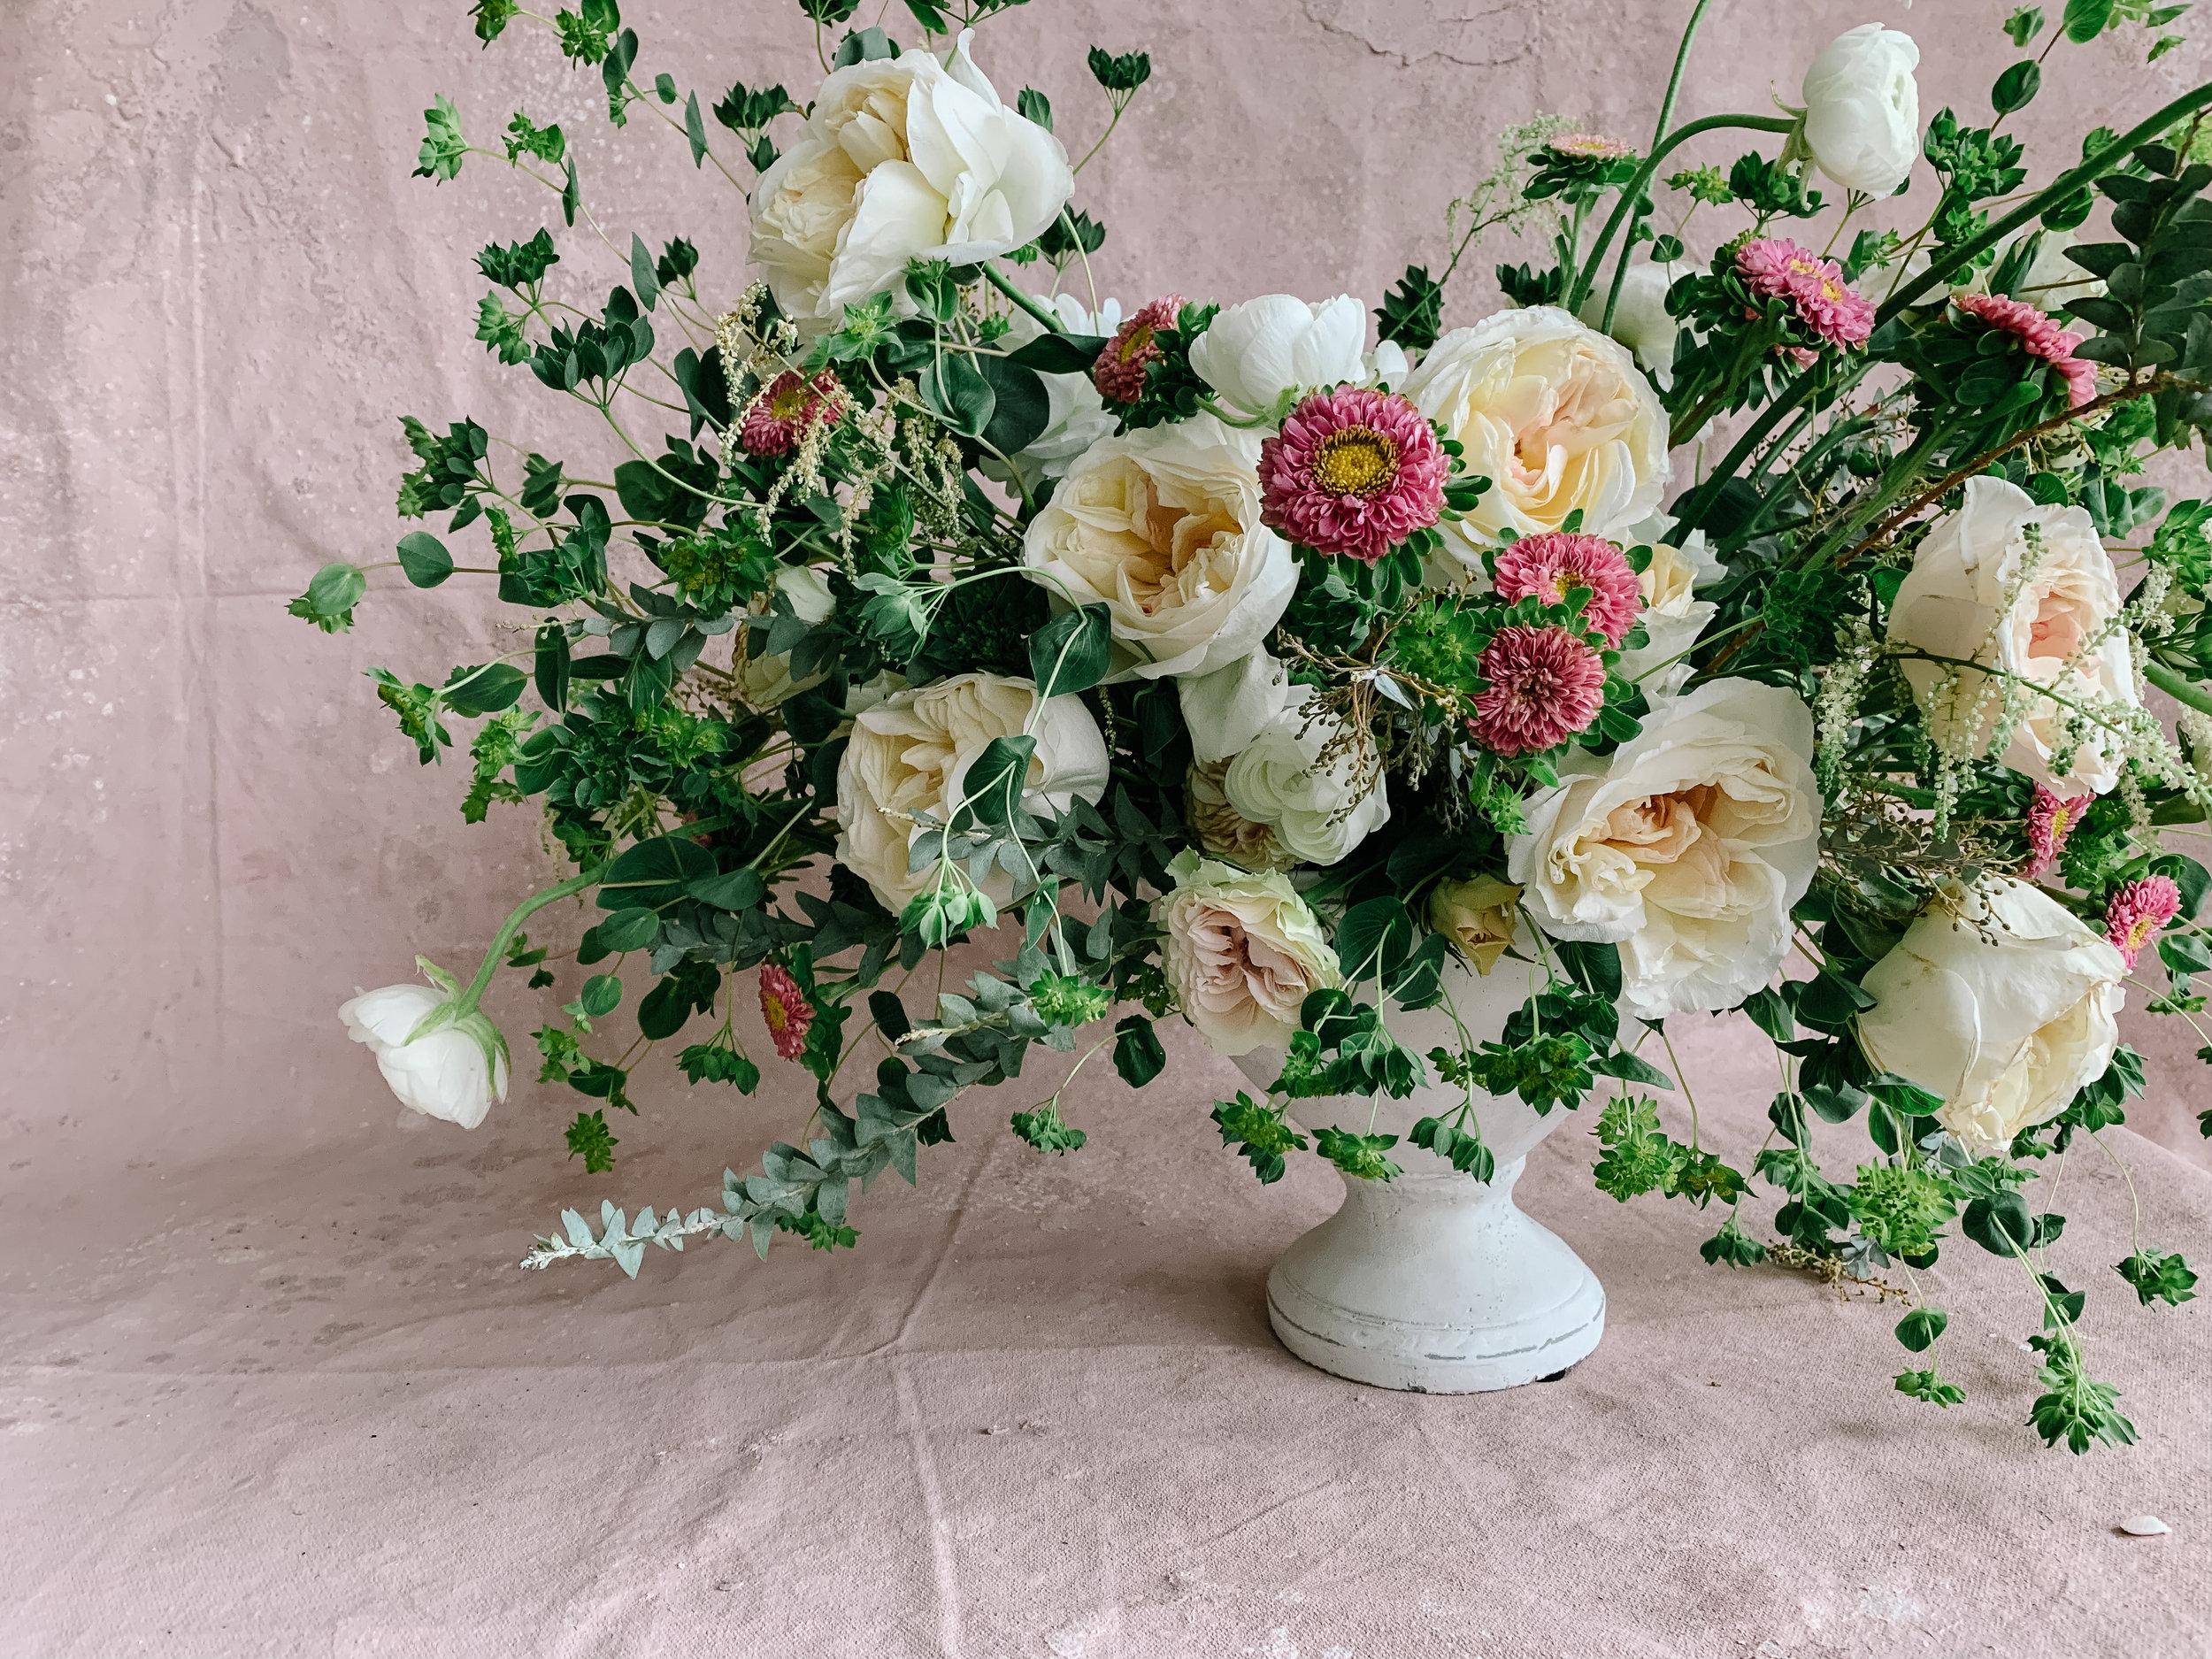 Create An Organic Floral Arrangement In 4 Easy Steps Detroit